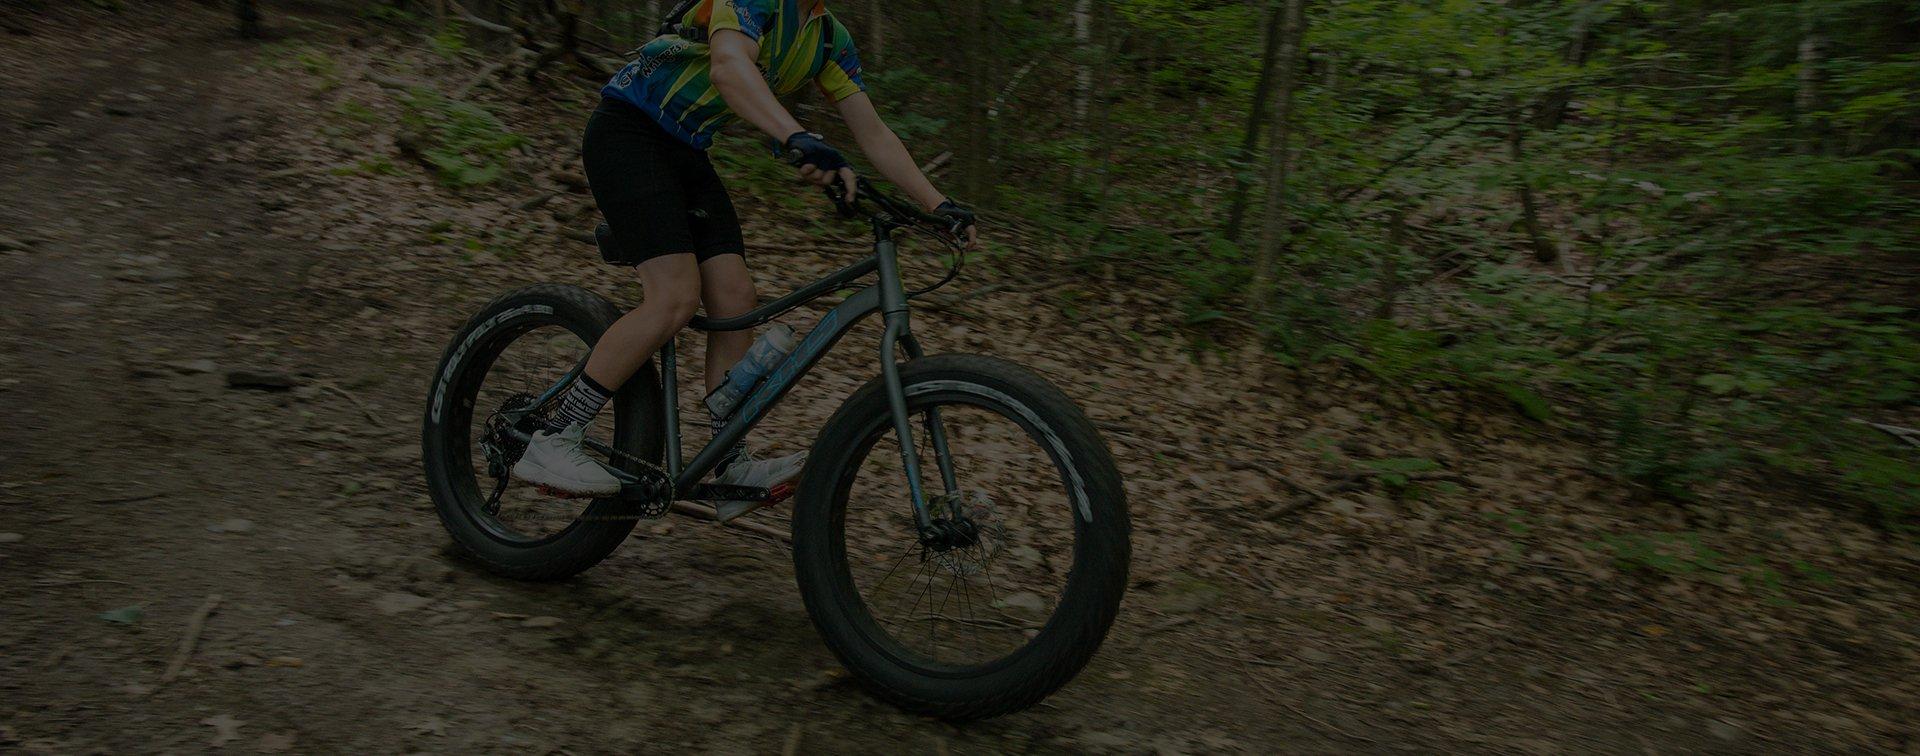 p2p_mtn_bike_ride_description_img